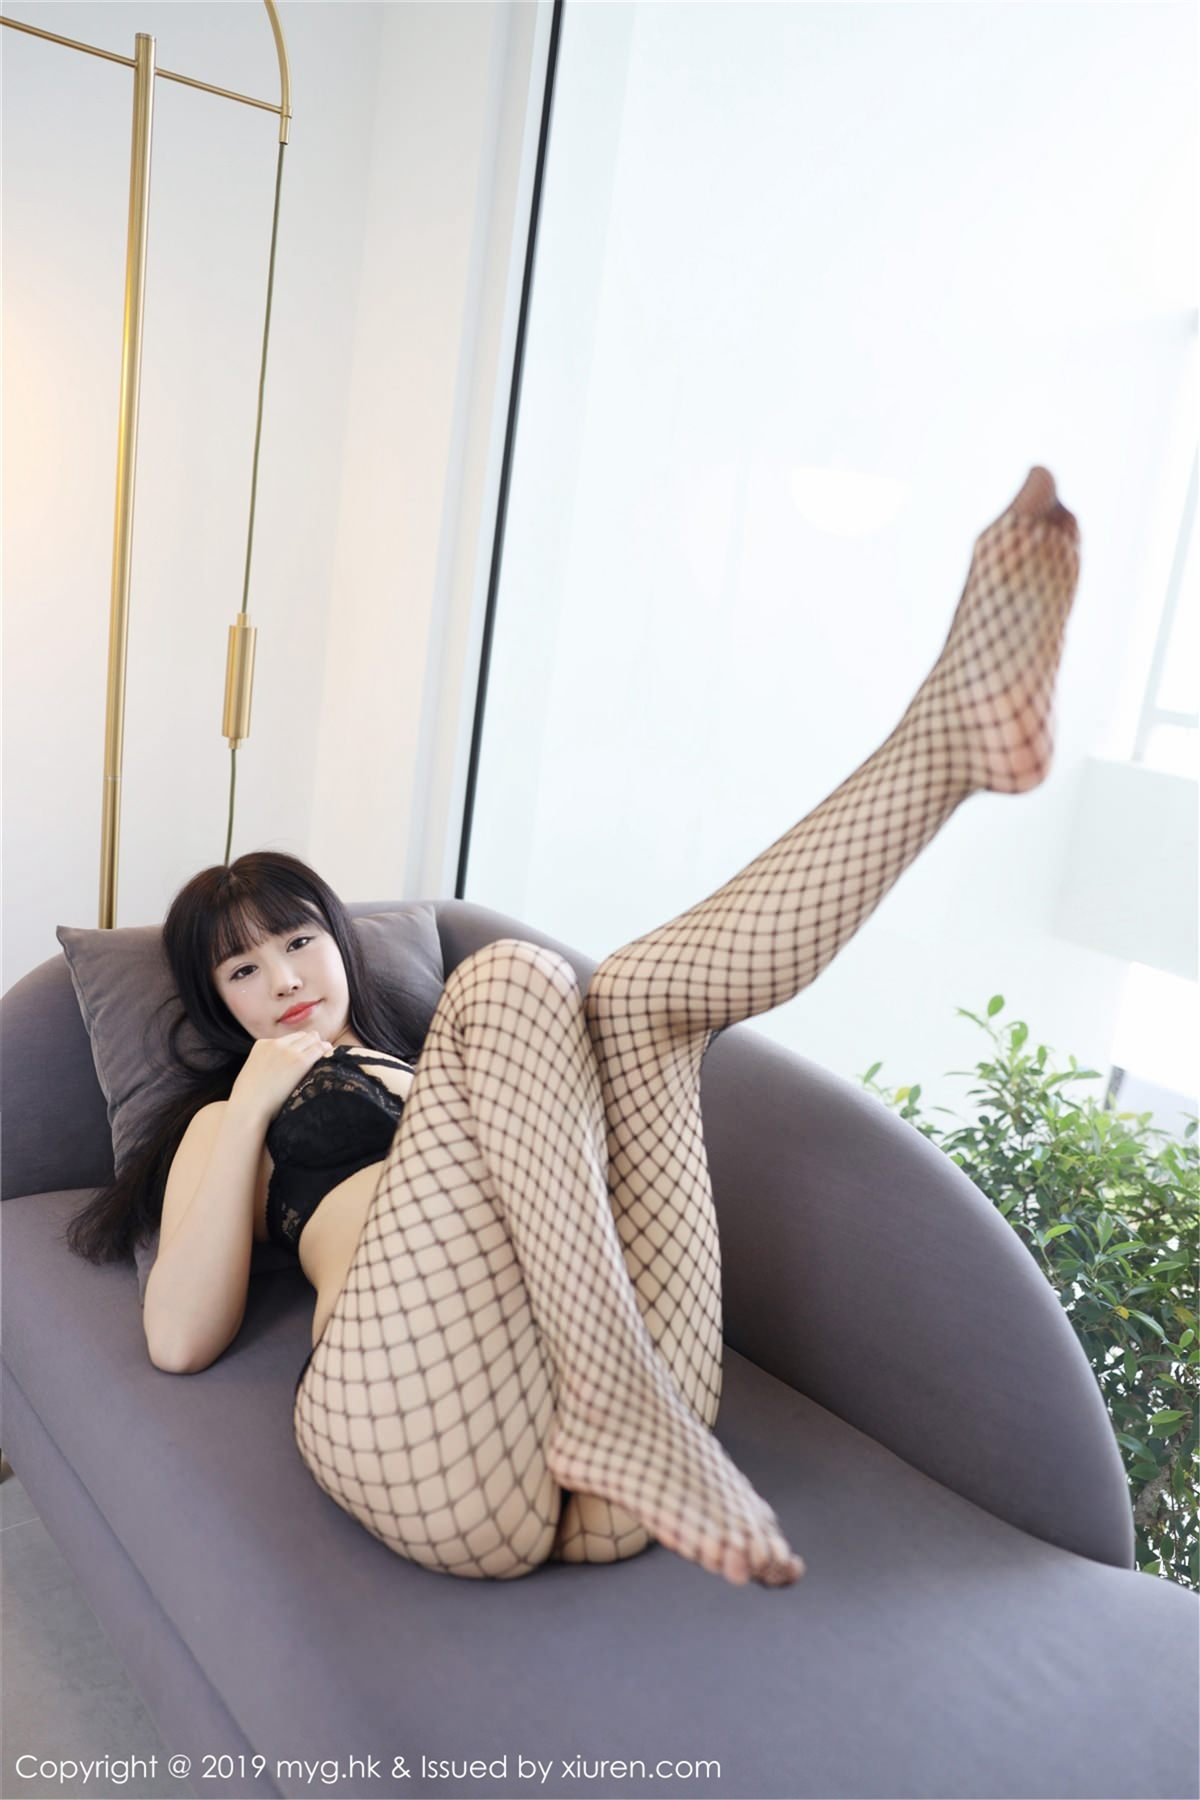 MyGirl Vol.357 31P, mygirl, Zhu Ke Er